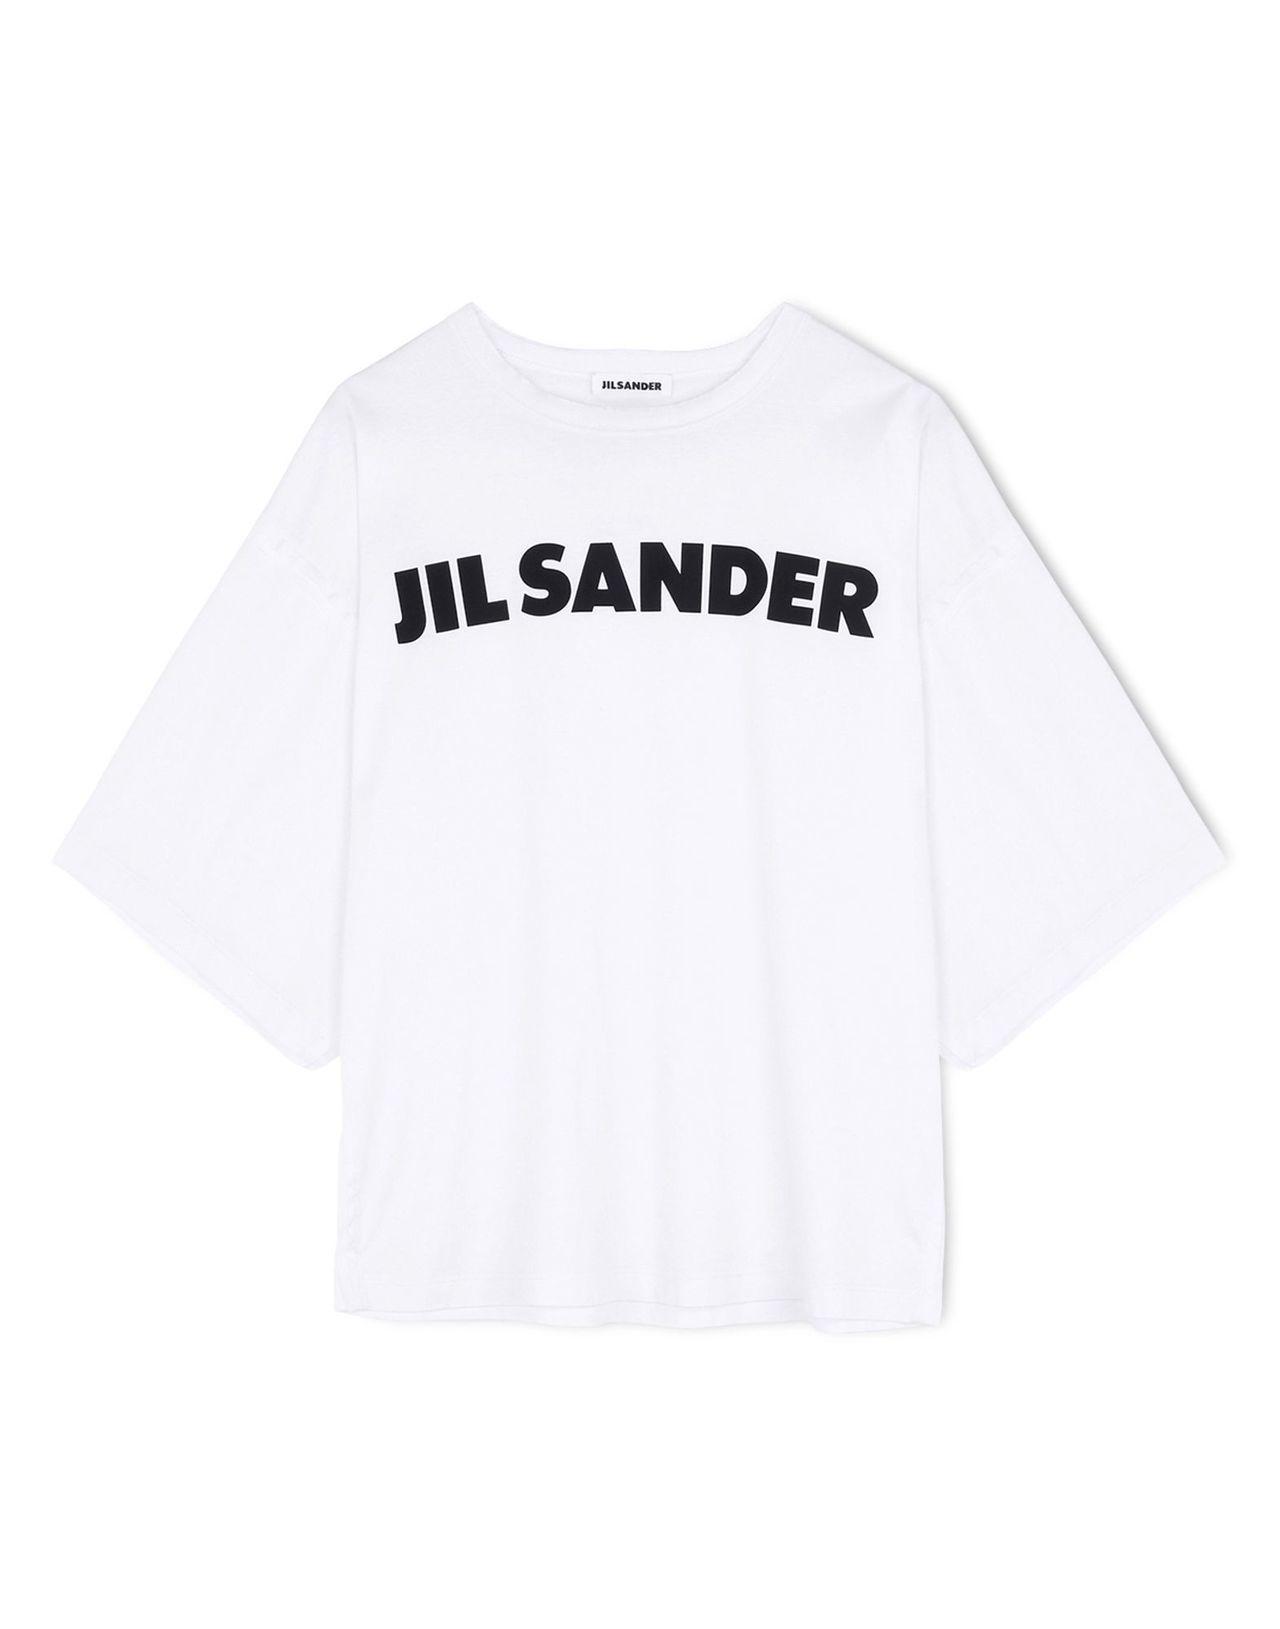 JIL SANDER T恤,售價12,980元。圖/ART HAUS提供